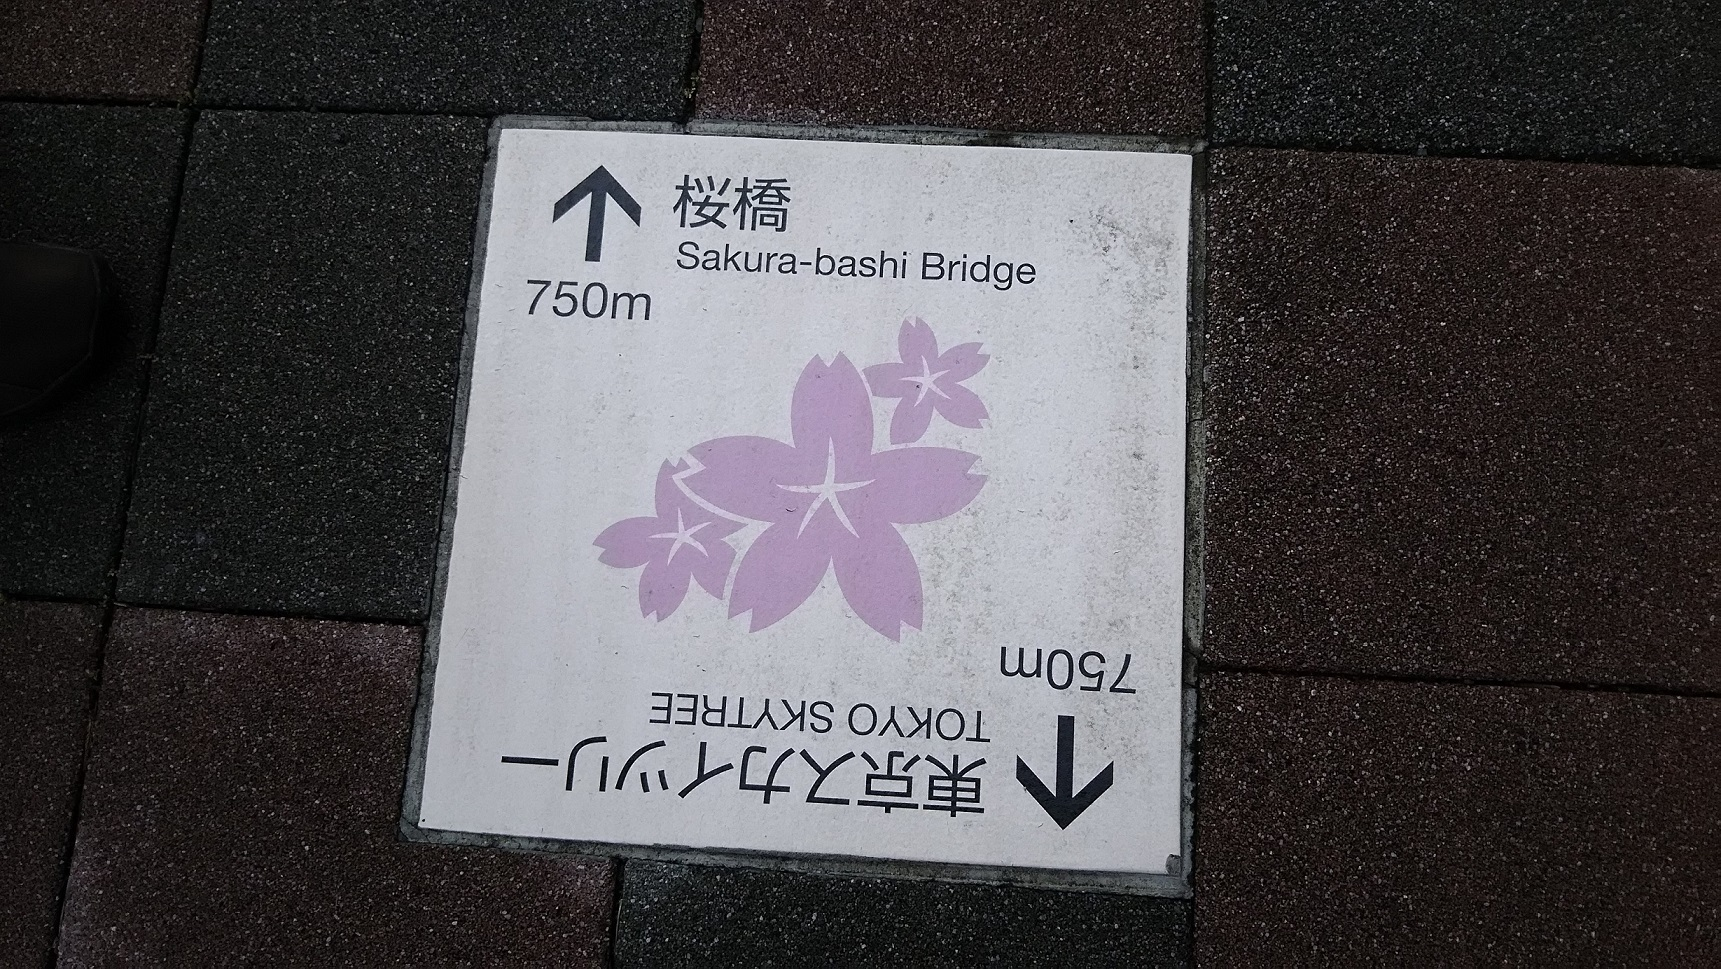 aDSC_0069.jpg